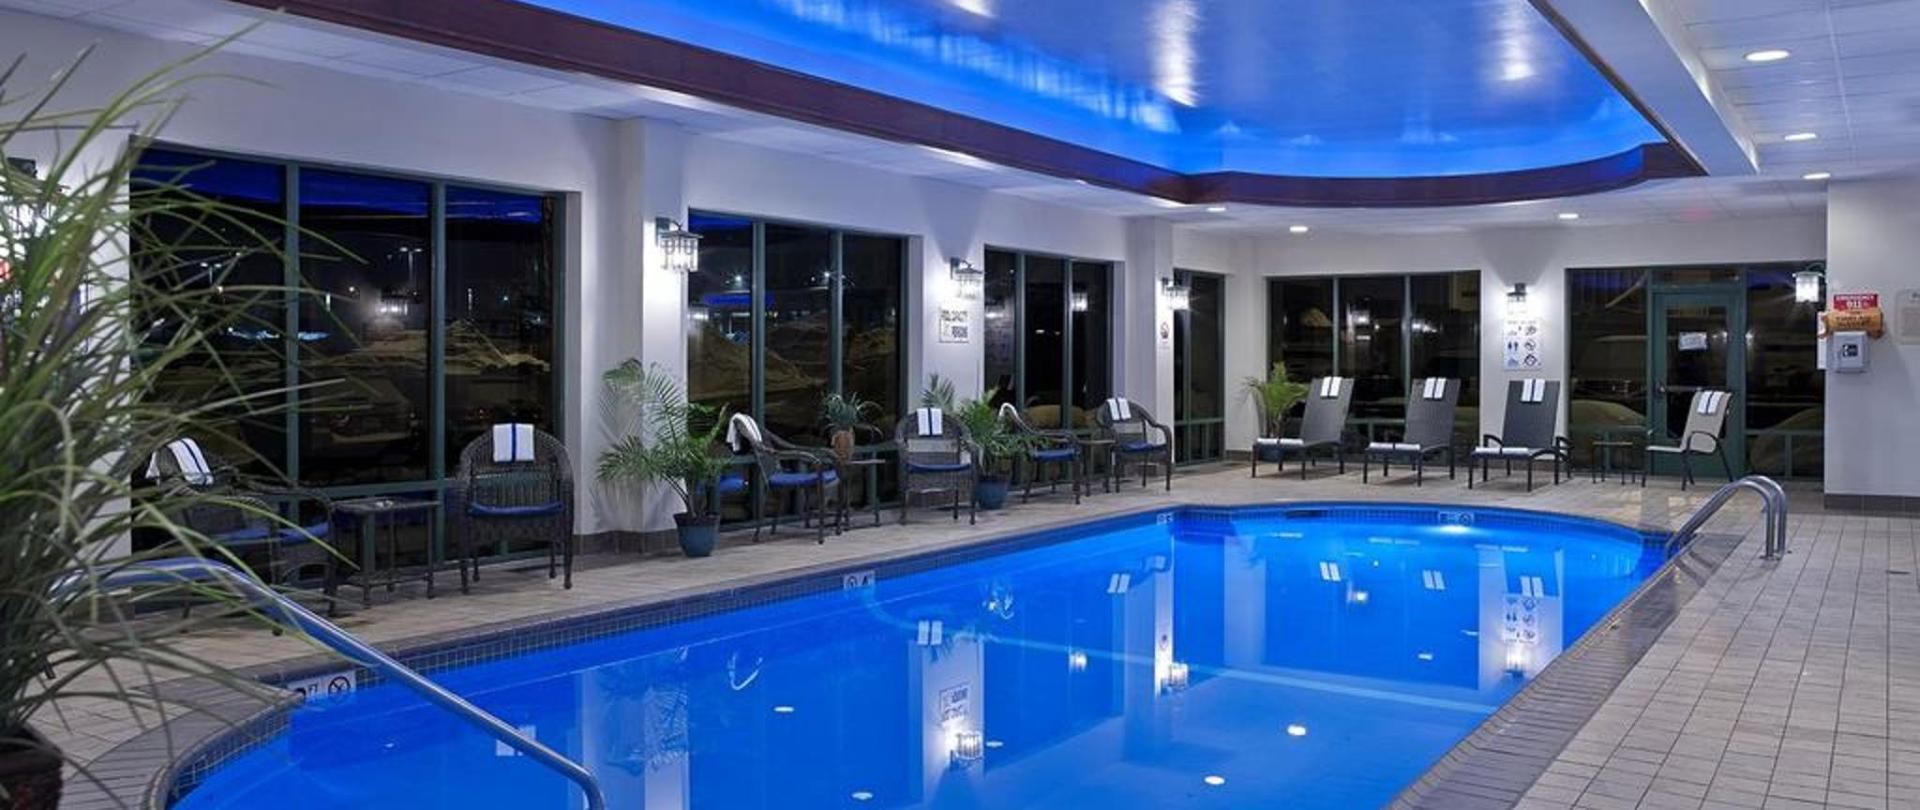 comfort inn suites boston near logan airport free. Black Bedroom Furniture Sets. Home Design Ideas